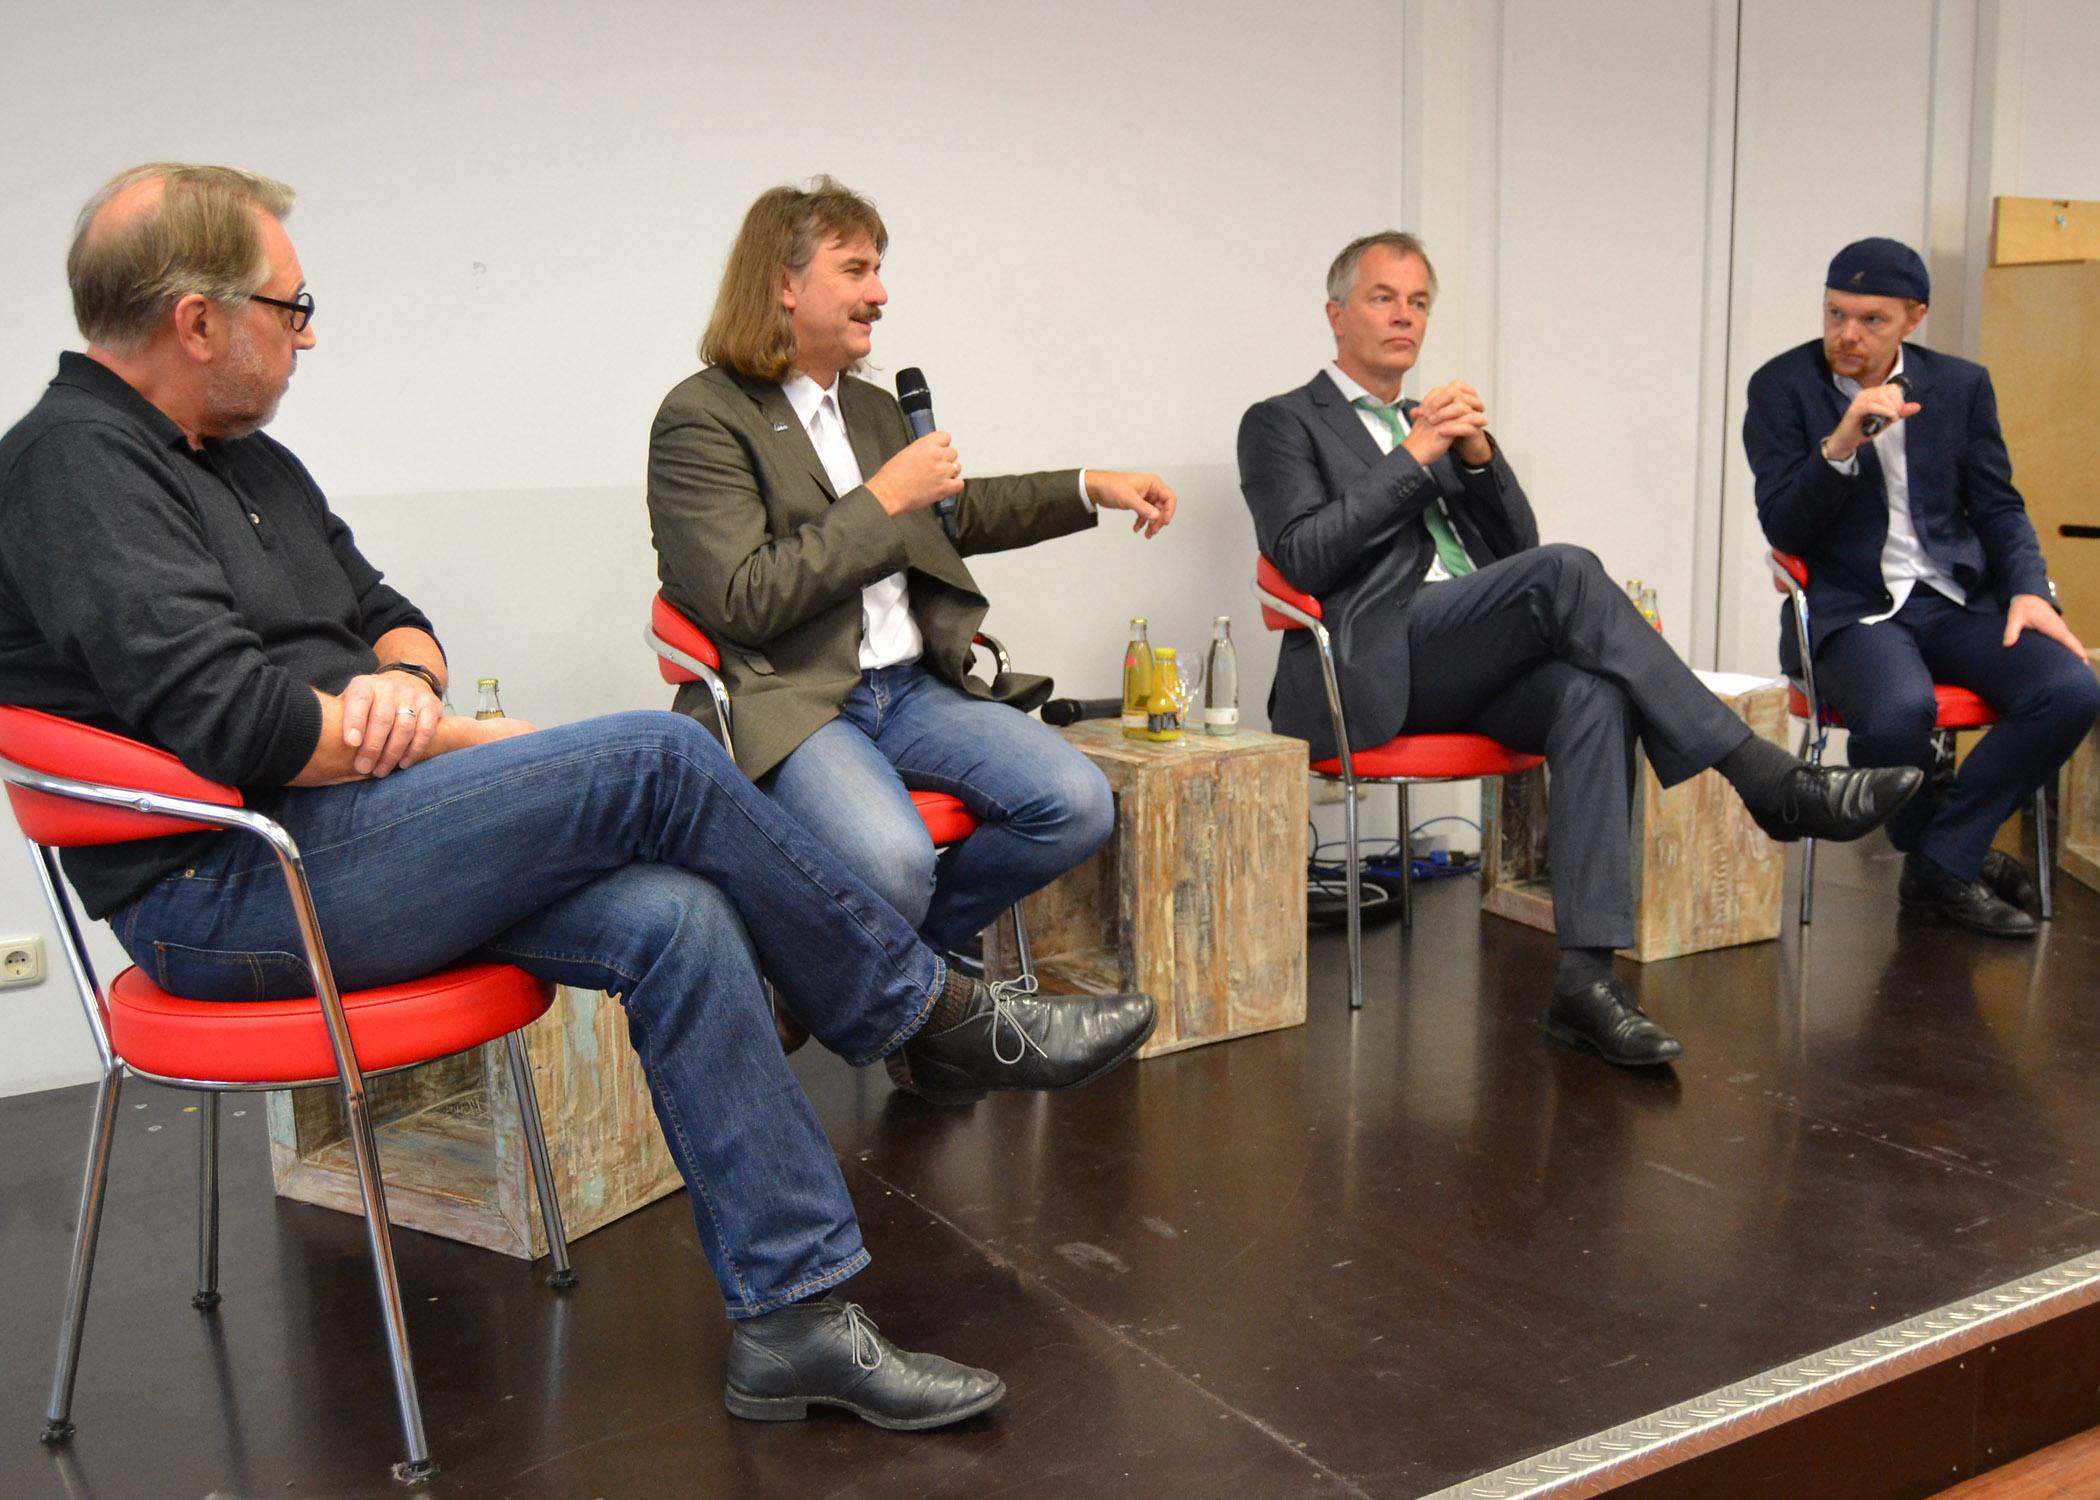 Teilnehmer der Gesprächsrunde v.l.n.r.: Hans Hausmann, Josef Tumbrinck, Johannes Remmel, Prof. Dr. Hektor Haarkötter.